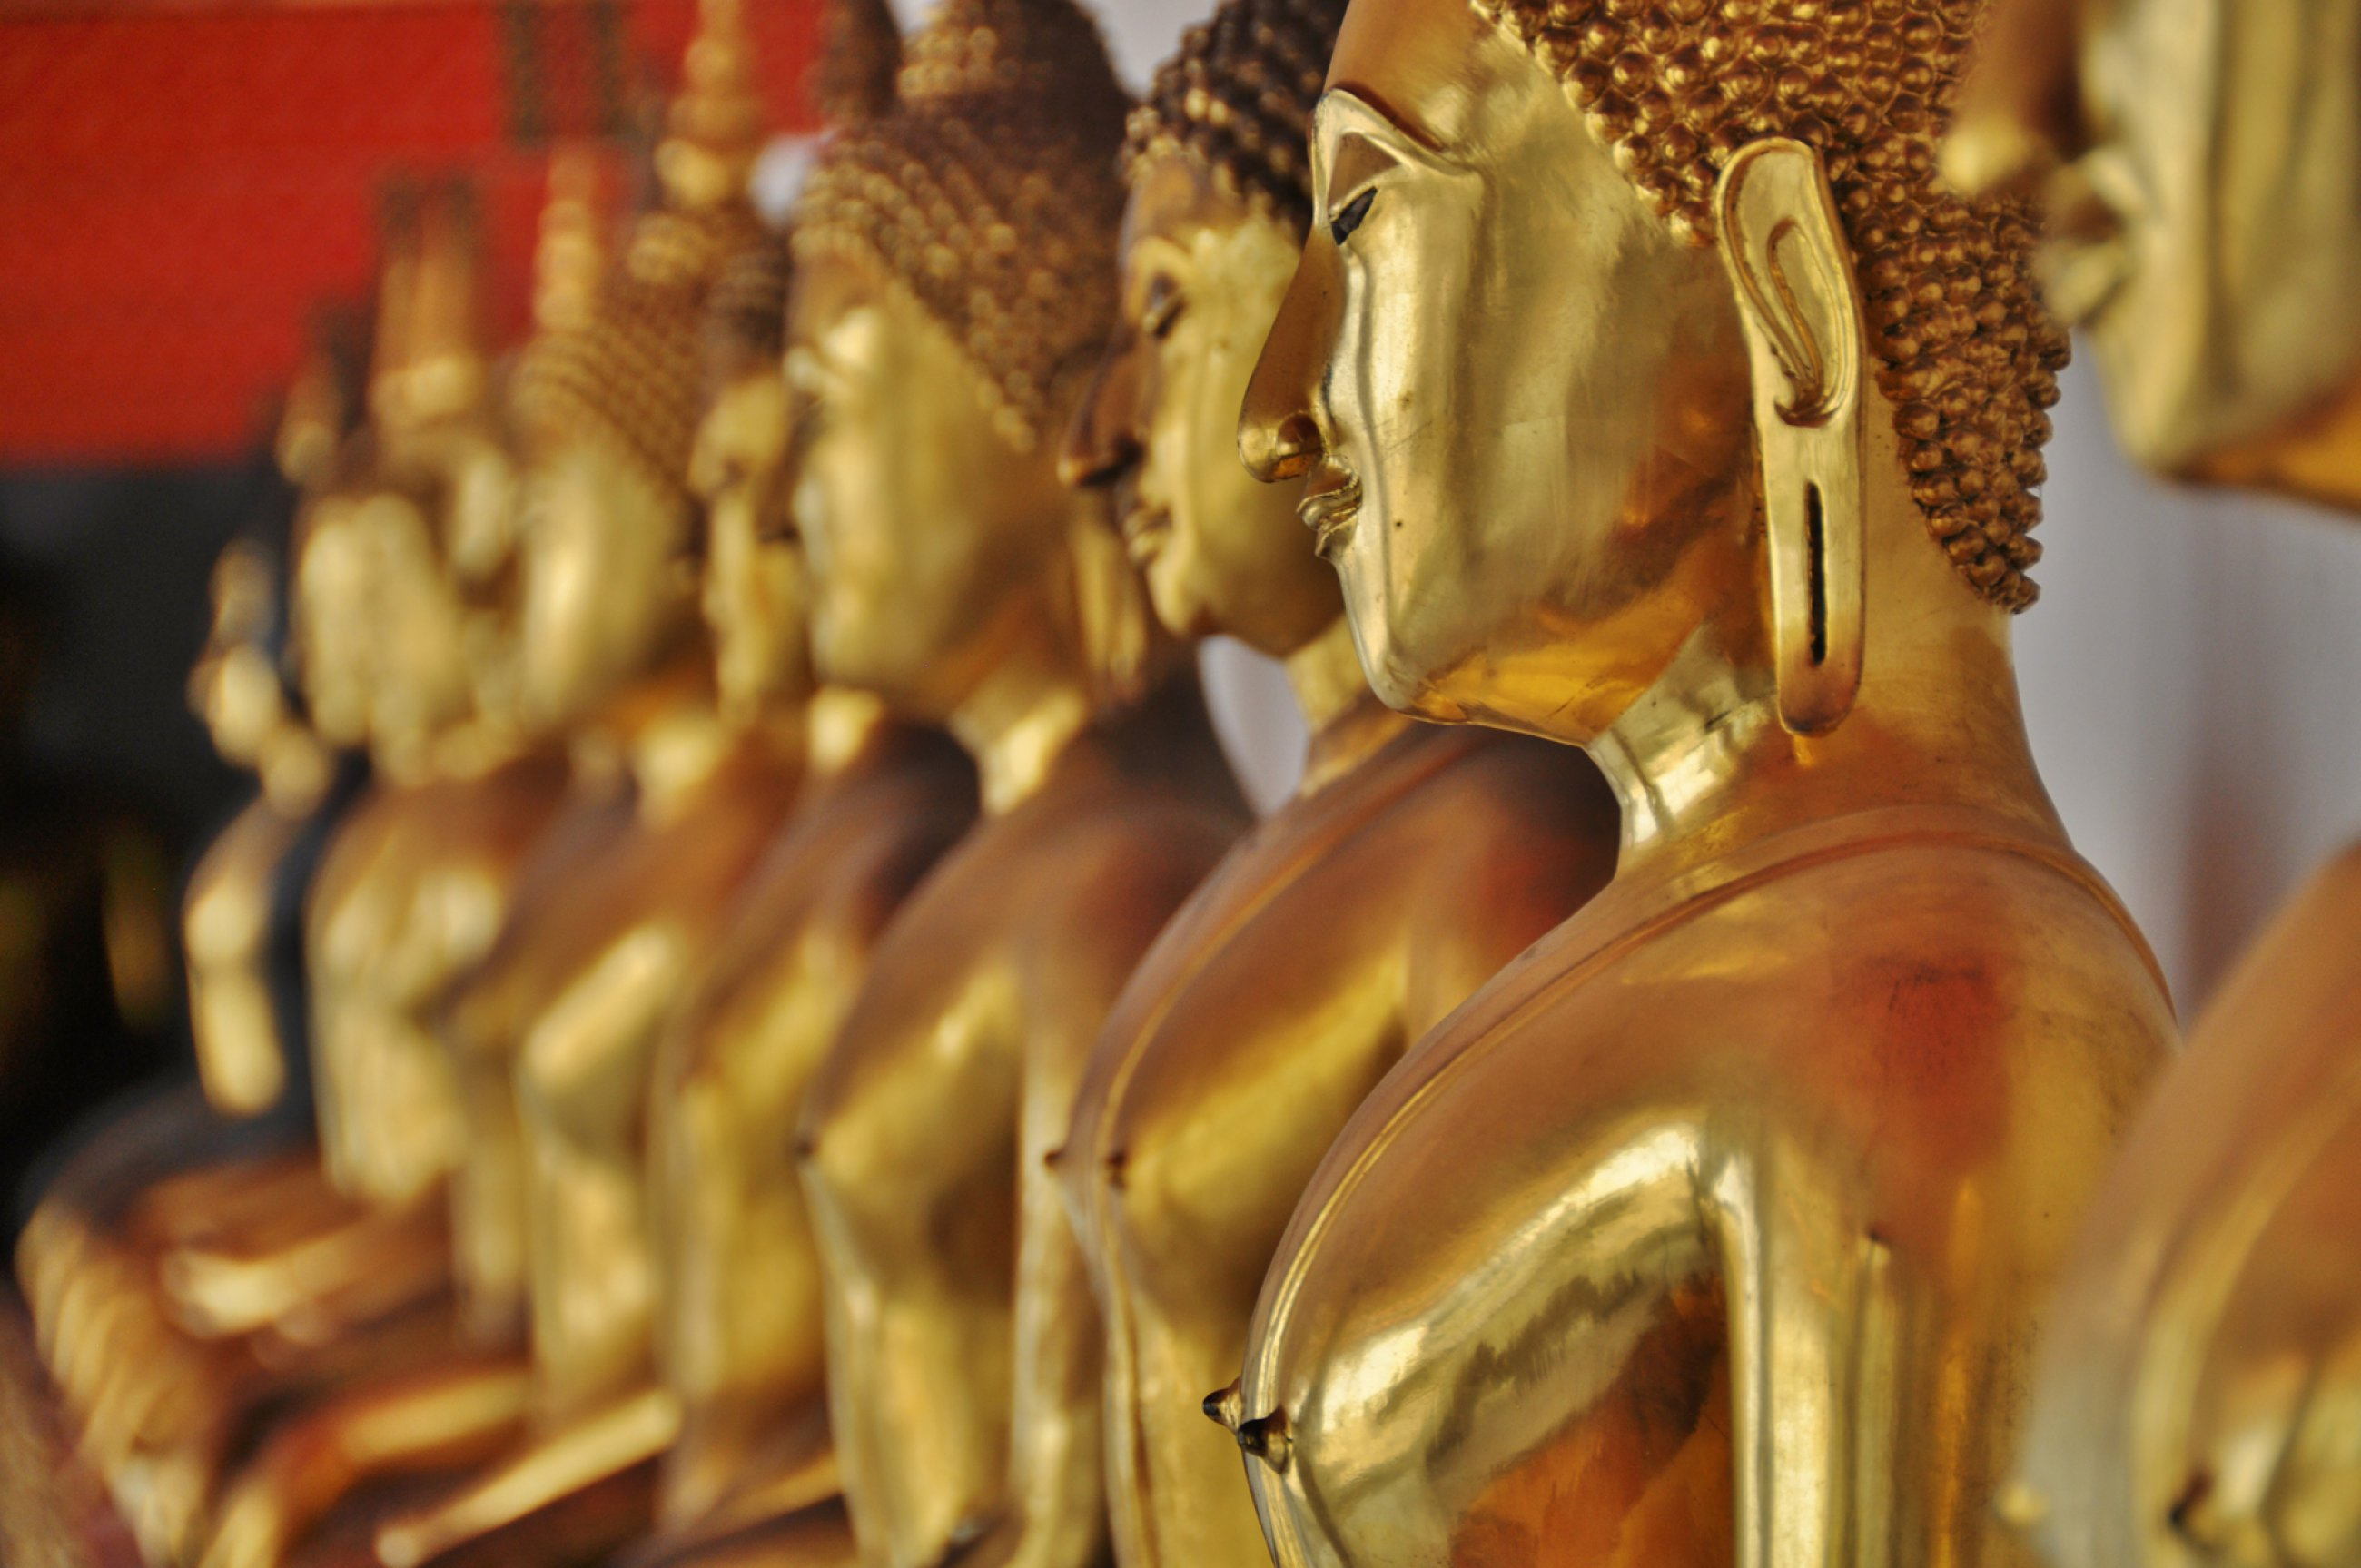 https://bubo.sk/uploads/galleries/5064/bkk-tomas-kubus-bangkok-2014-3-.jpg